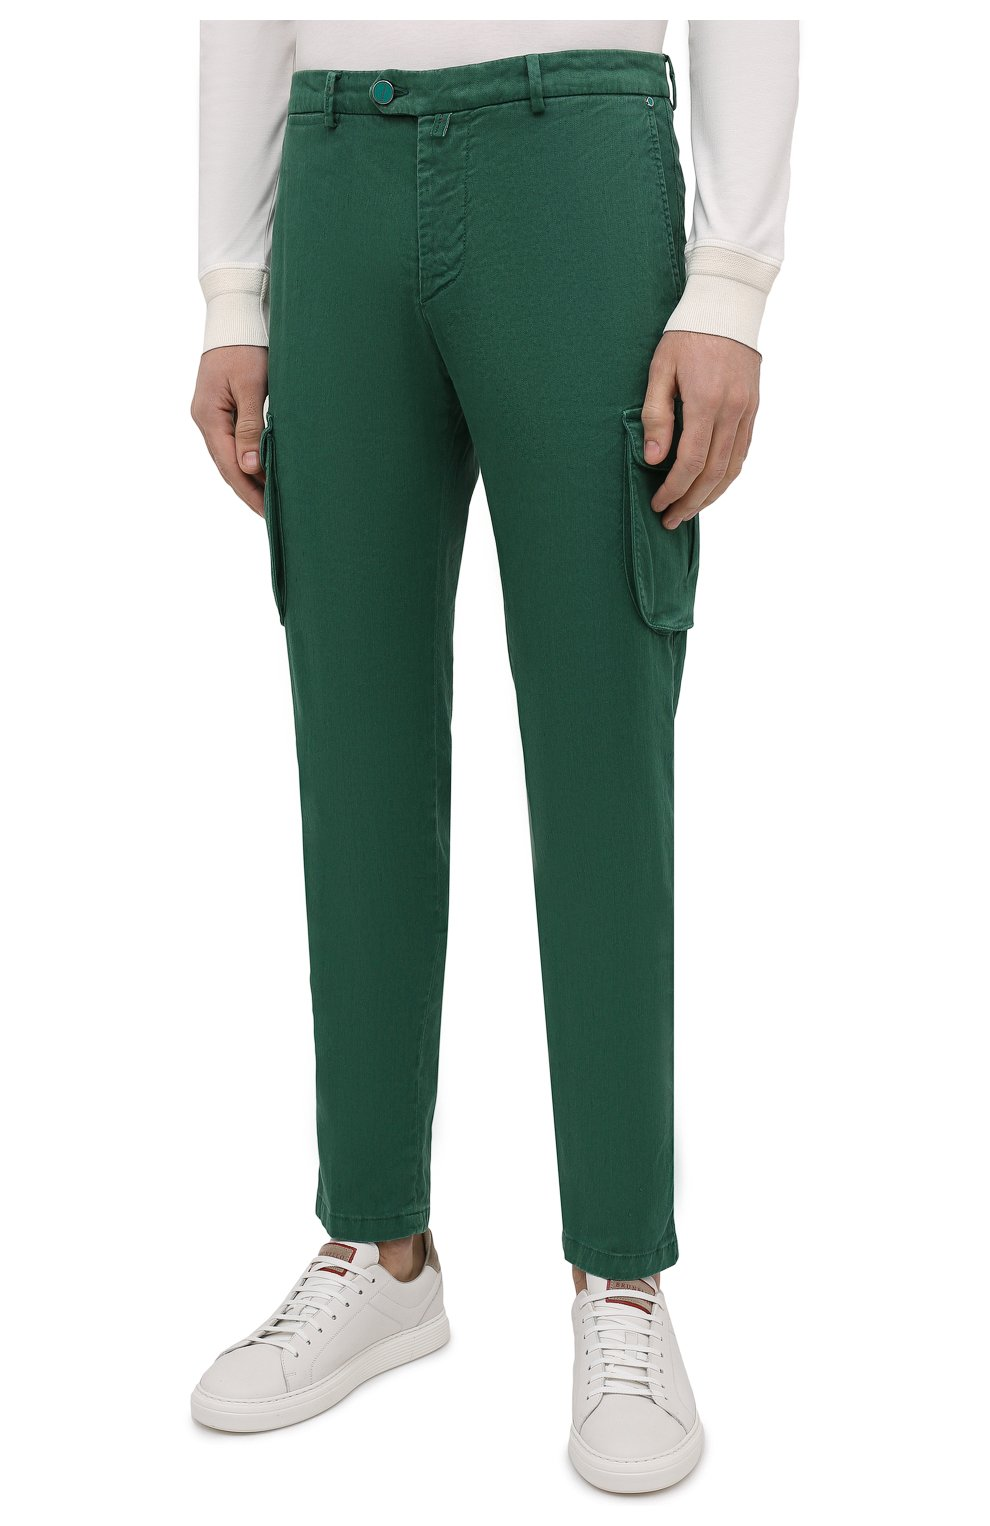 Мужские брюки-карго изо льна и хлопка KITON зеленого цвета, арт. UFPPCAJ07T38   Фото 3